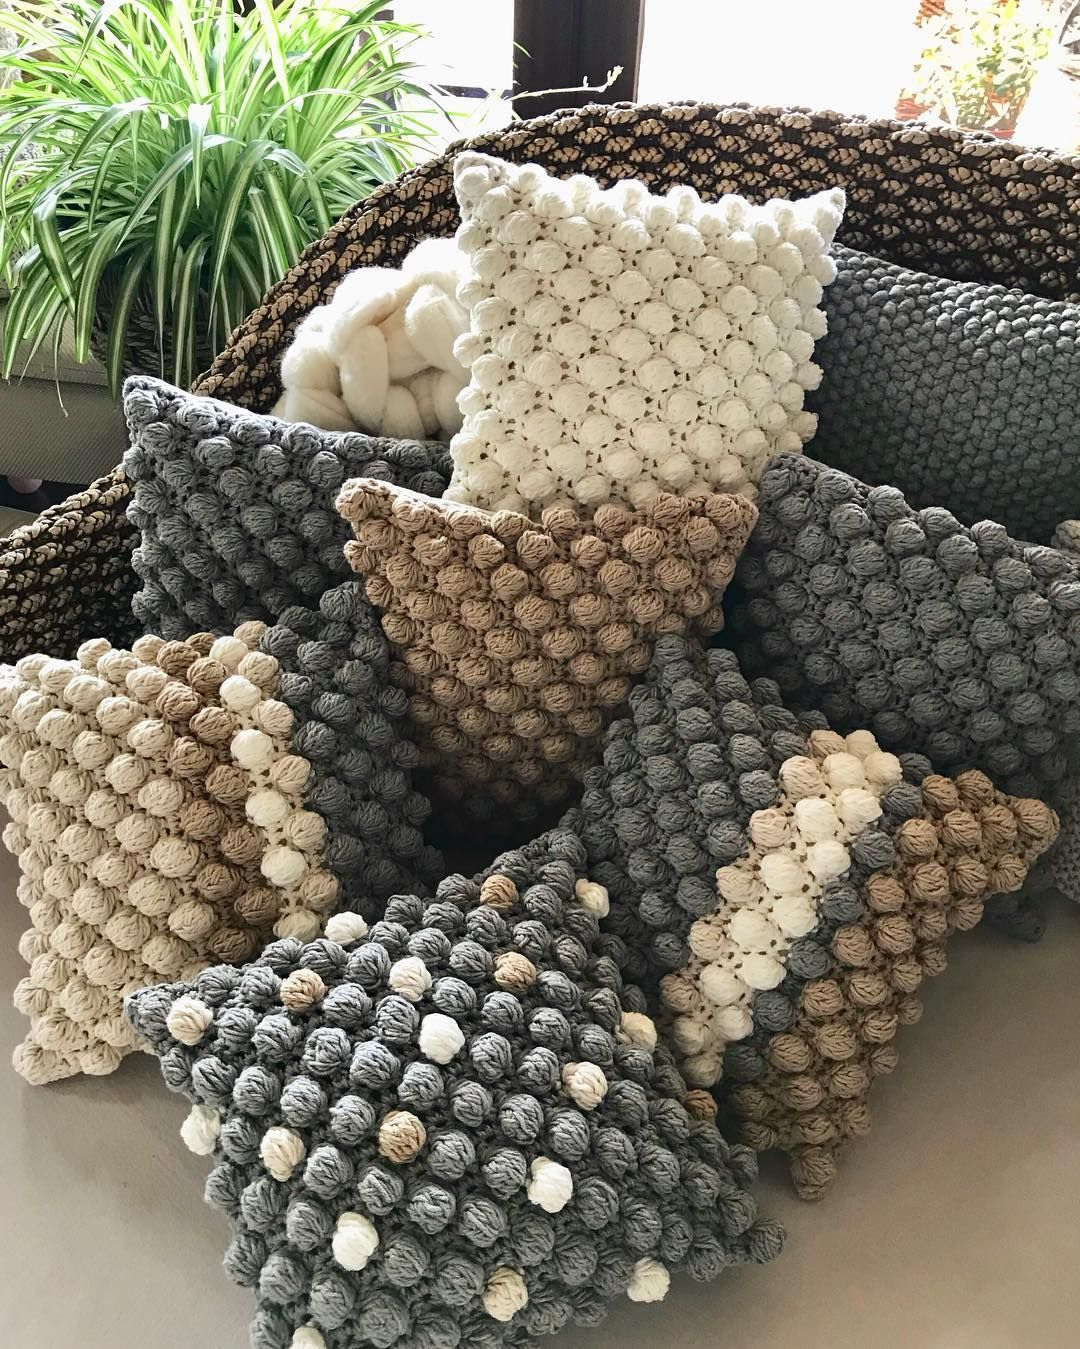 "Individual Home Decor on Instagram: ""Bubble pillow ❤️❤️😘#crochet #pillows #pillow #beige #natur #nature #natural #grey #gray #striped  #polkadot #insta #instacrochet…"""